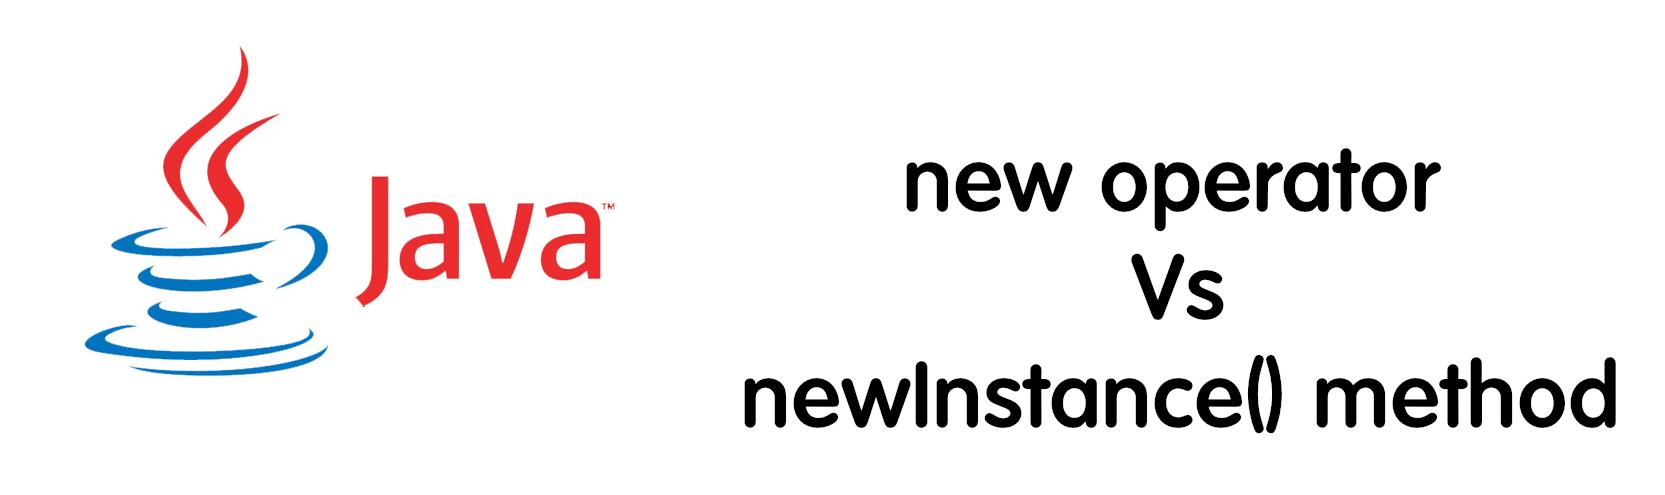 new operator vs newInstance method